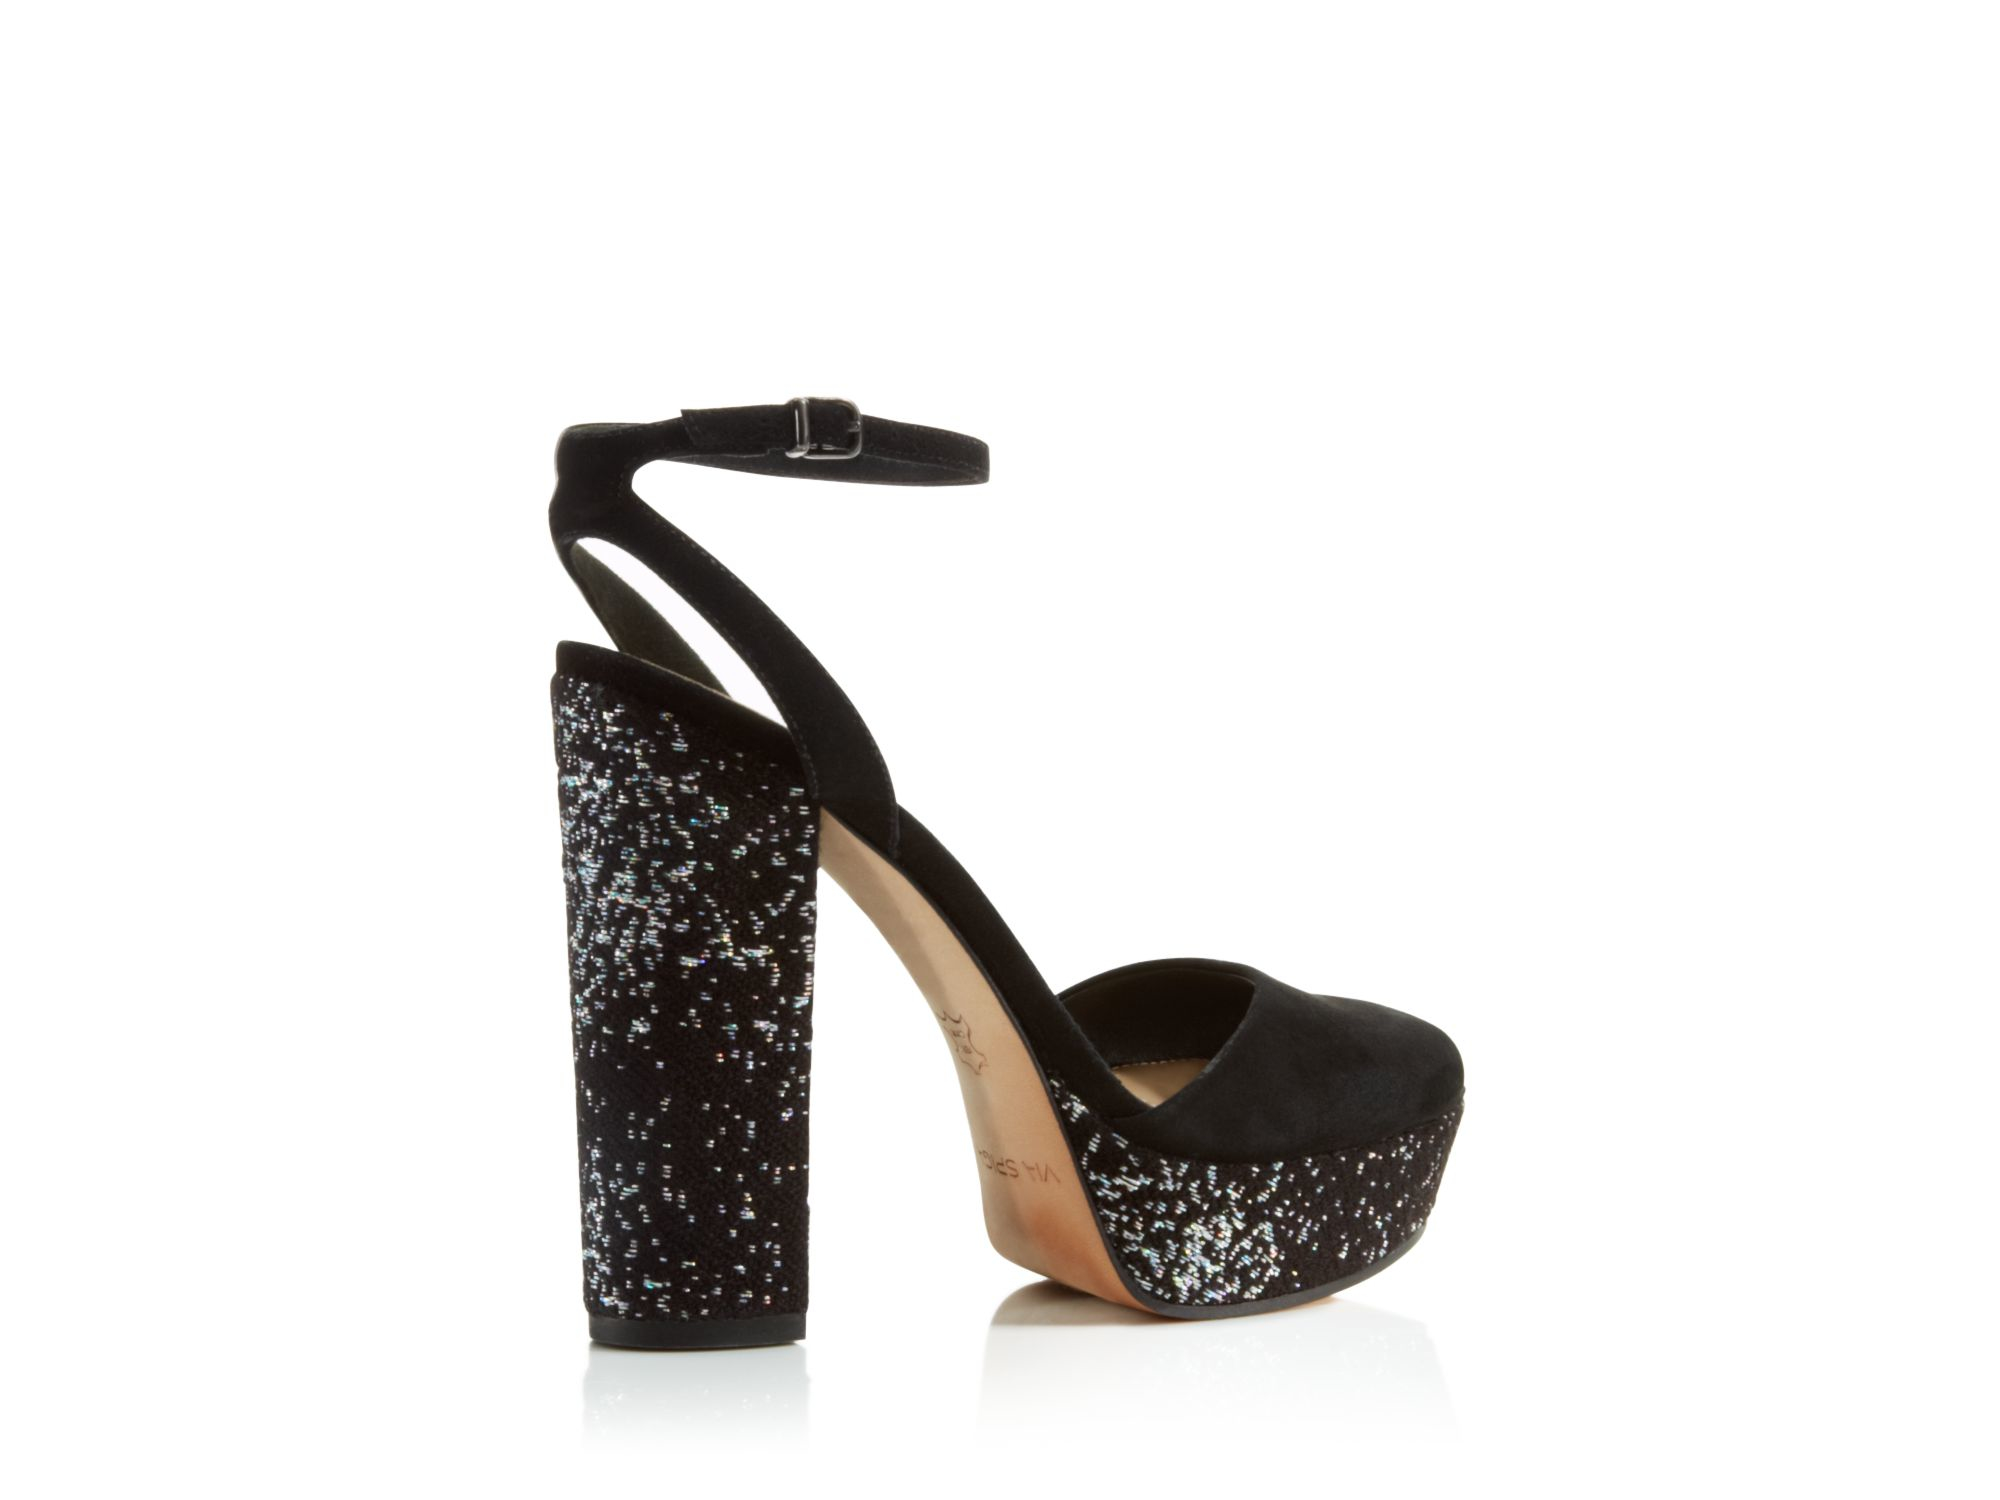 Via Spiga Varsha Platform High Heel Sandals In Black Lyst